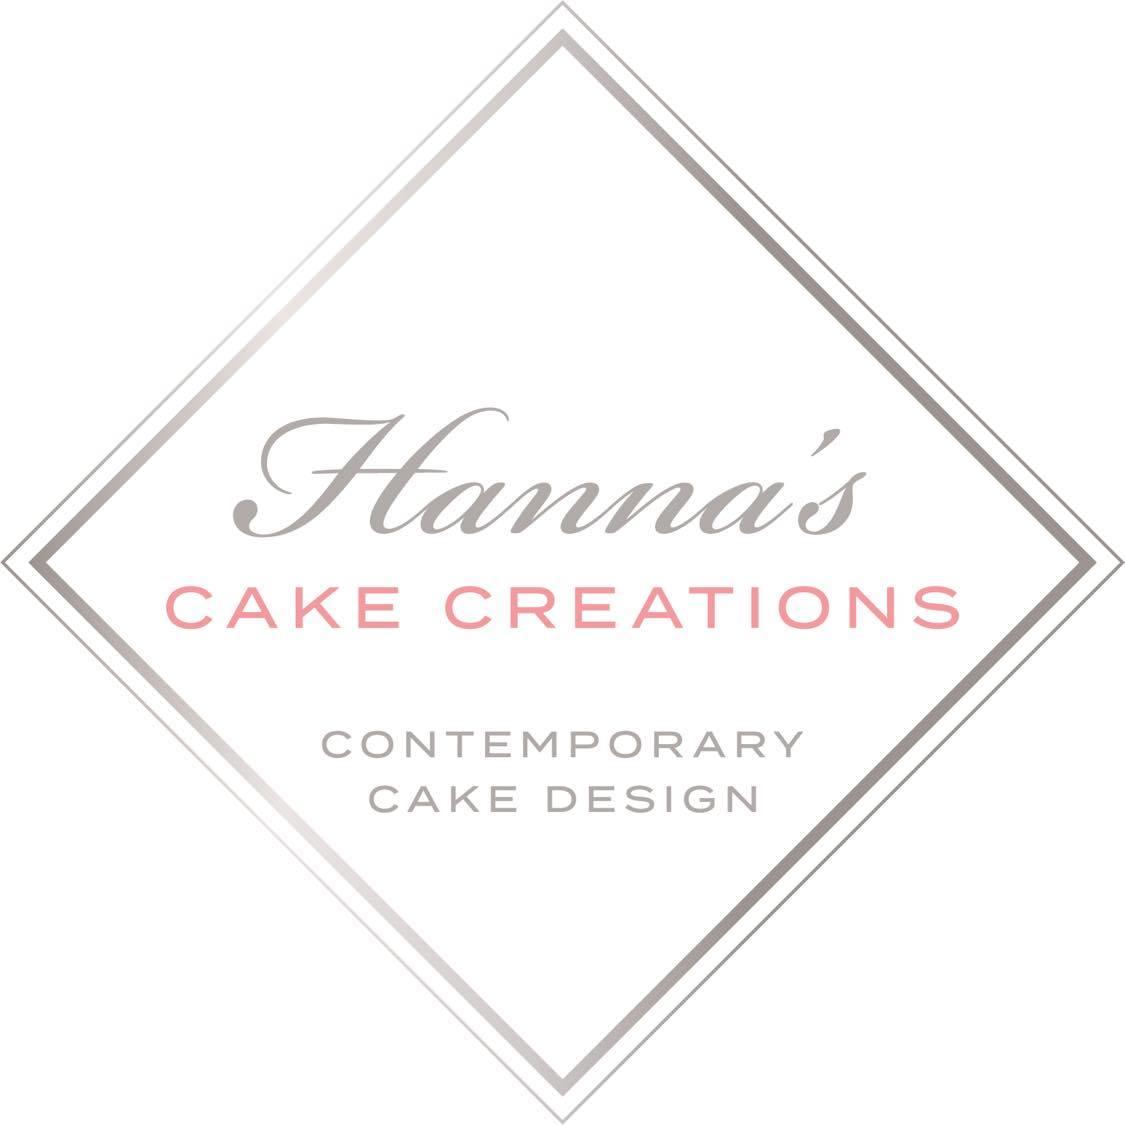 Hanna's cake creations